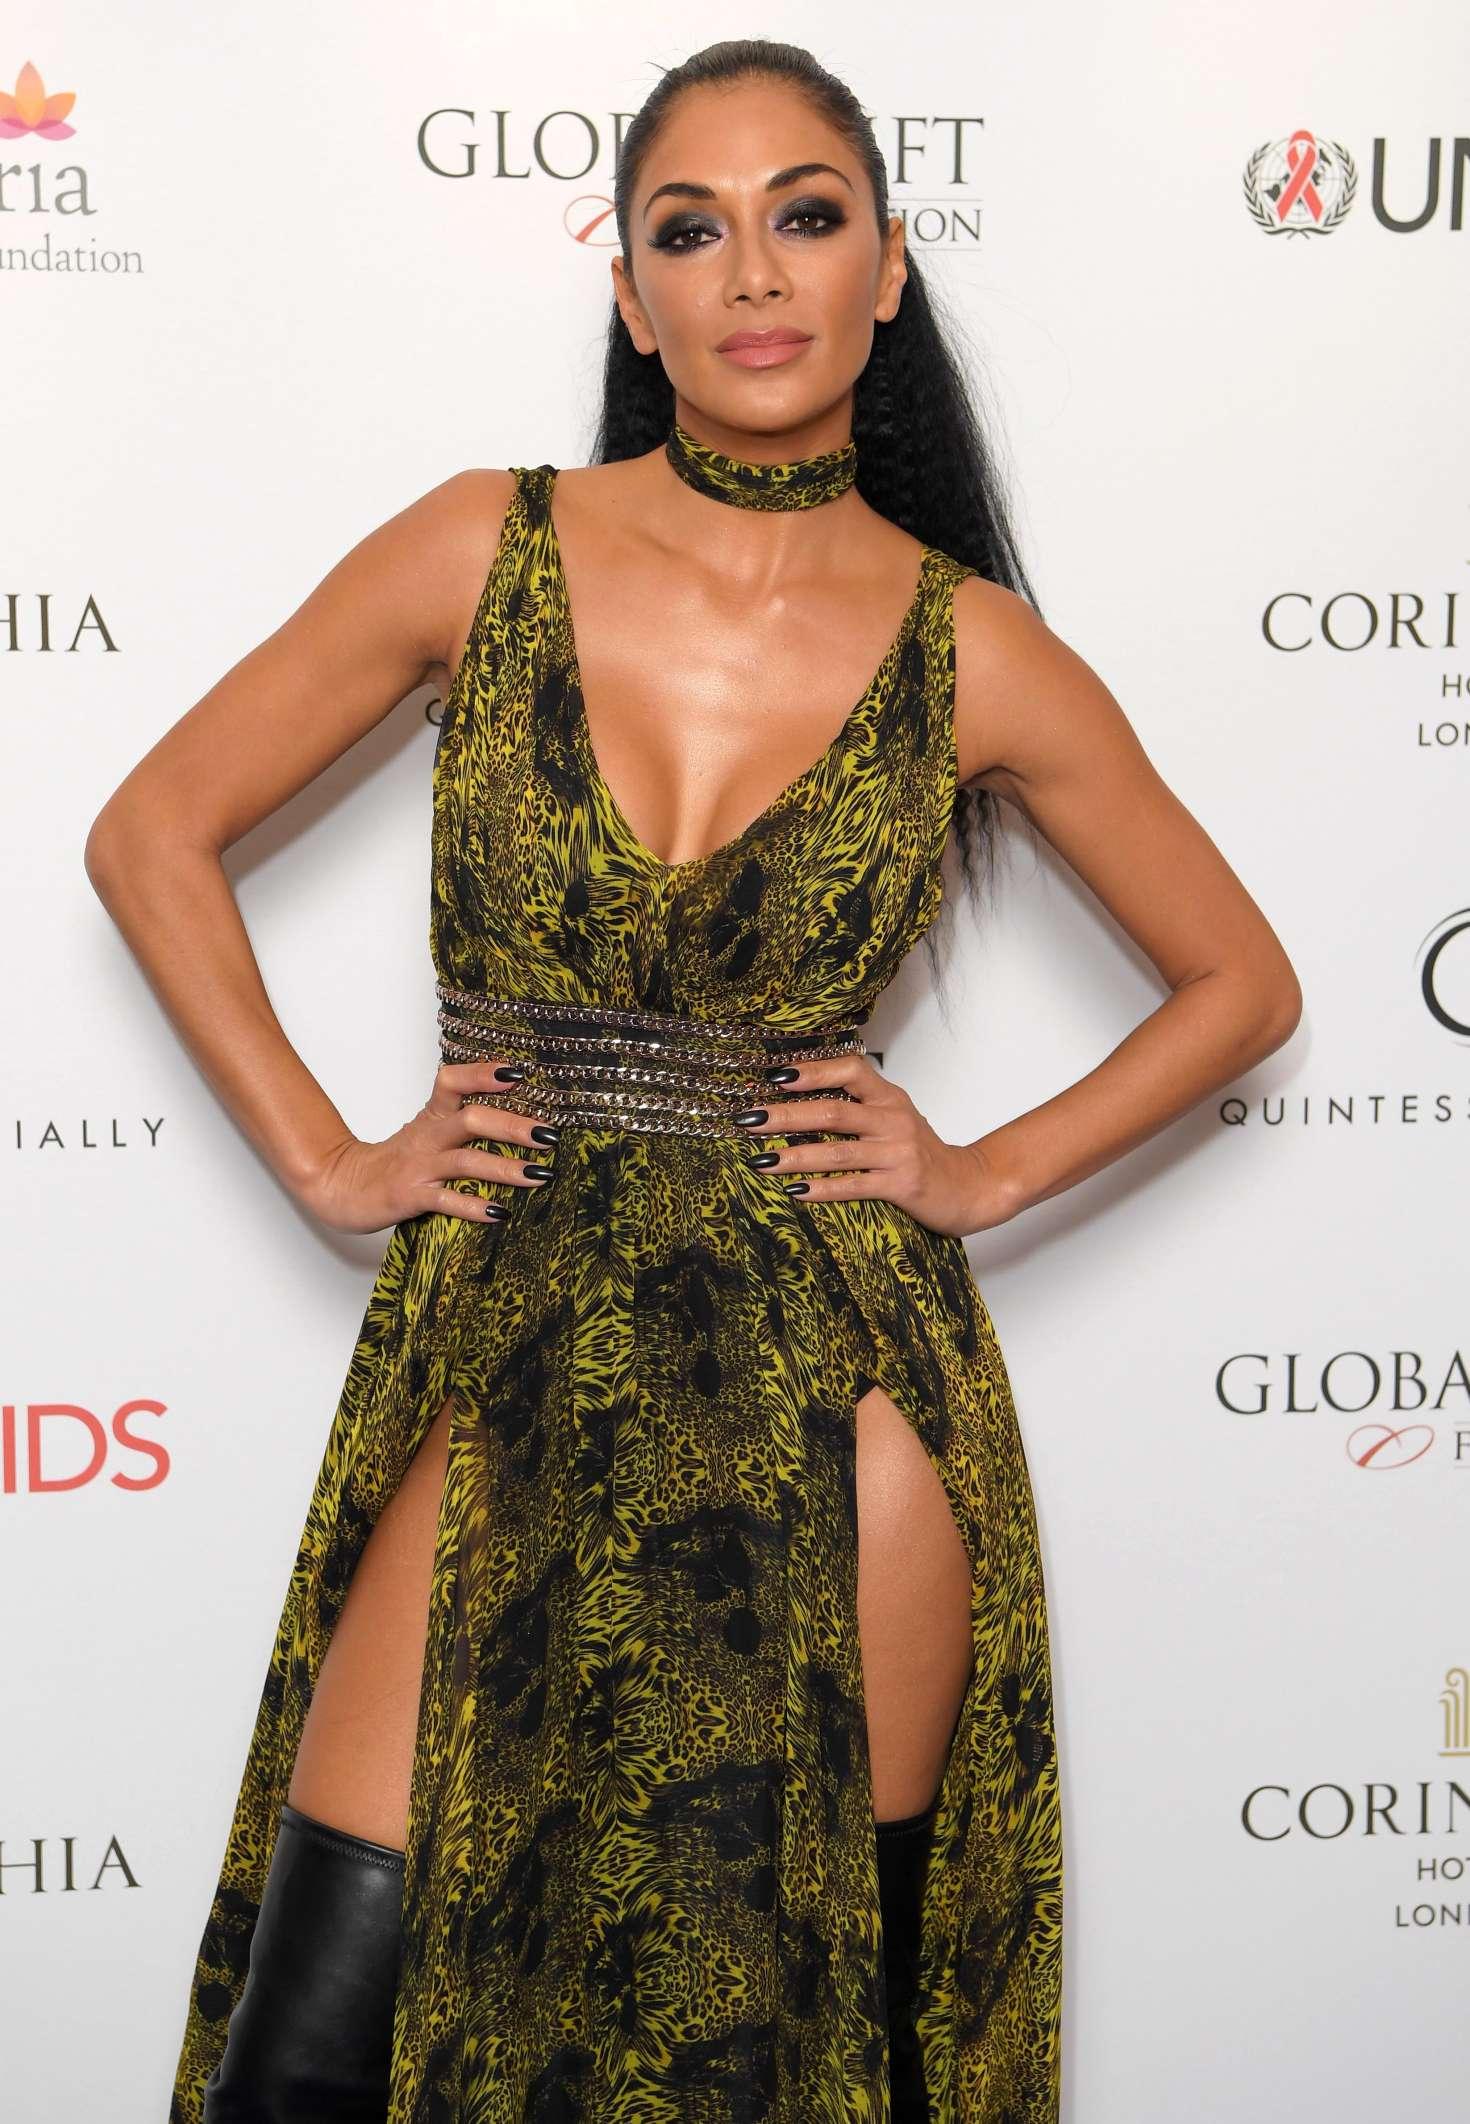 Nicole Scherzinger - The Global Gift Gala 2016 in London